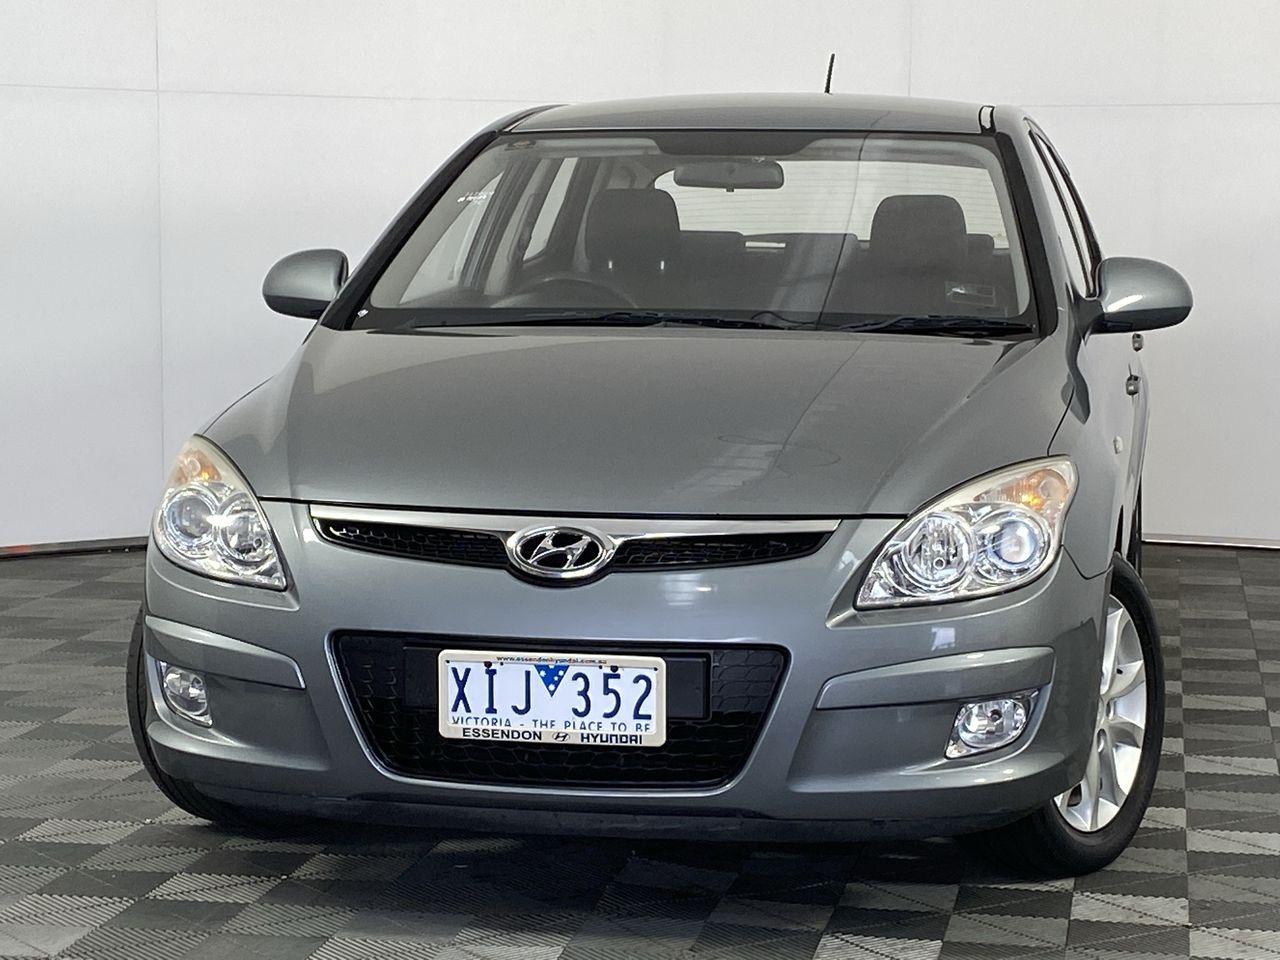 2009 Hyundai i30 SLX FD Manual Hatchback